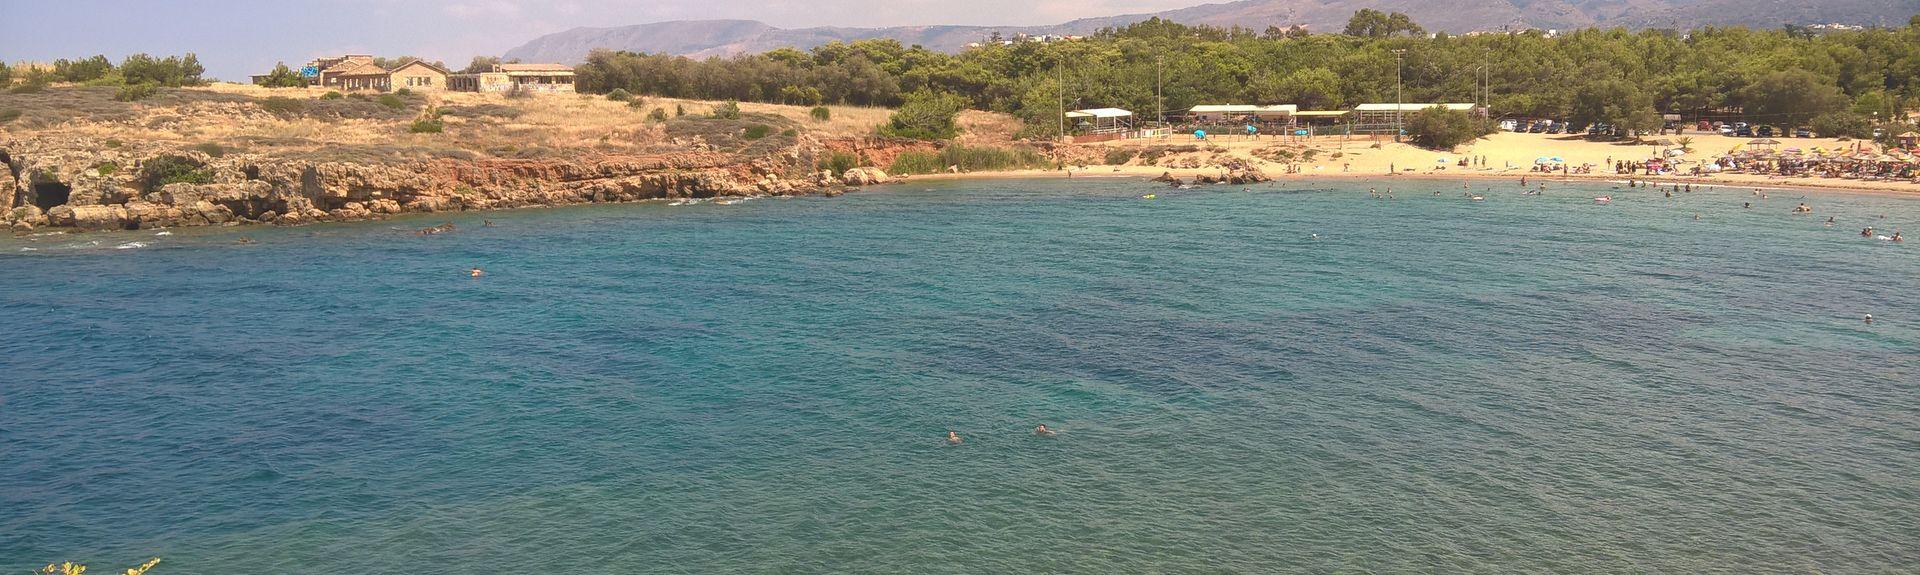 Mousoures, Ilha de Creta, Grécia